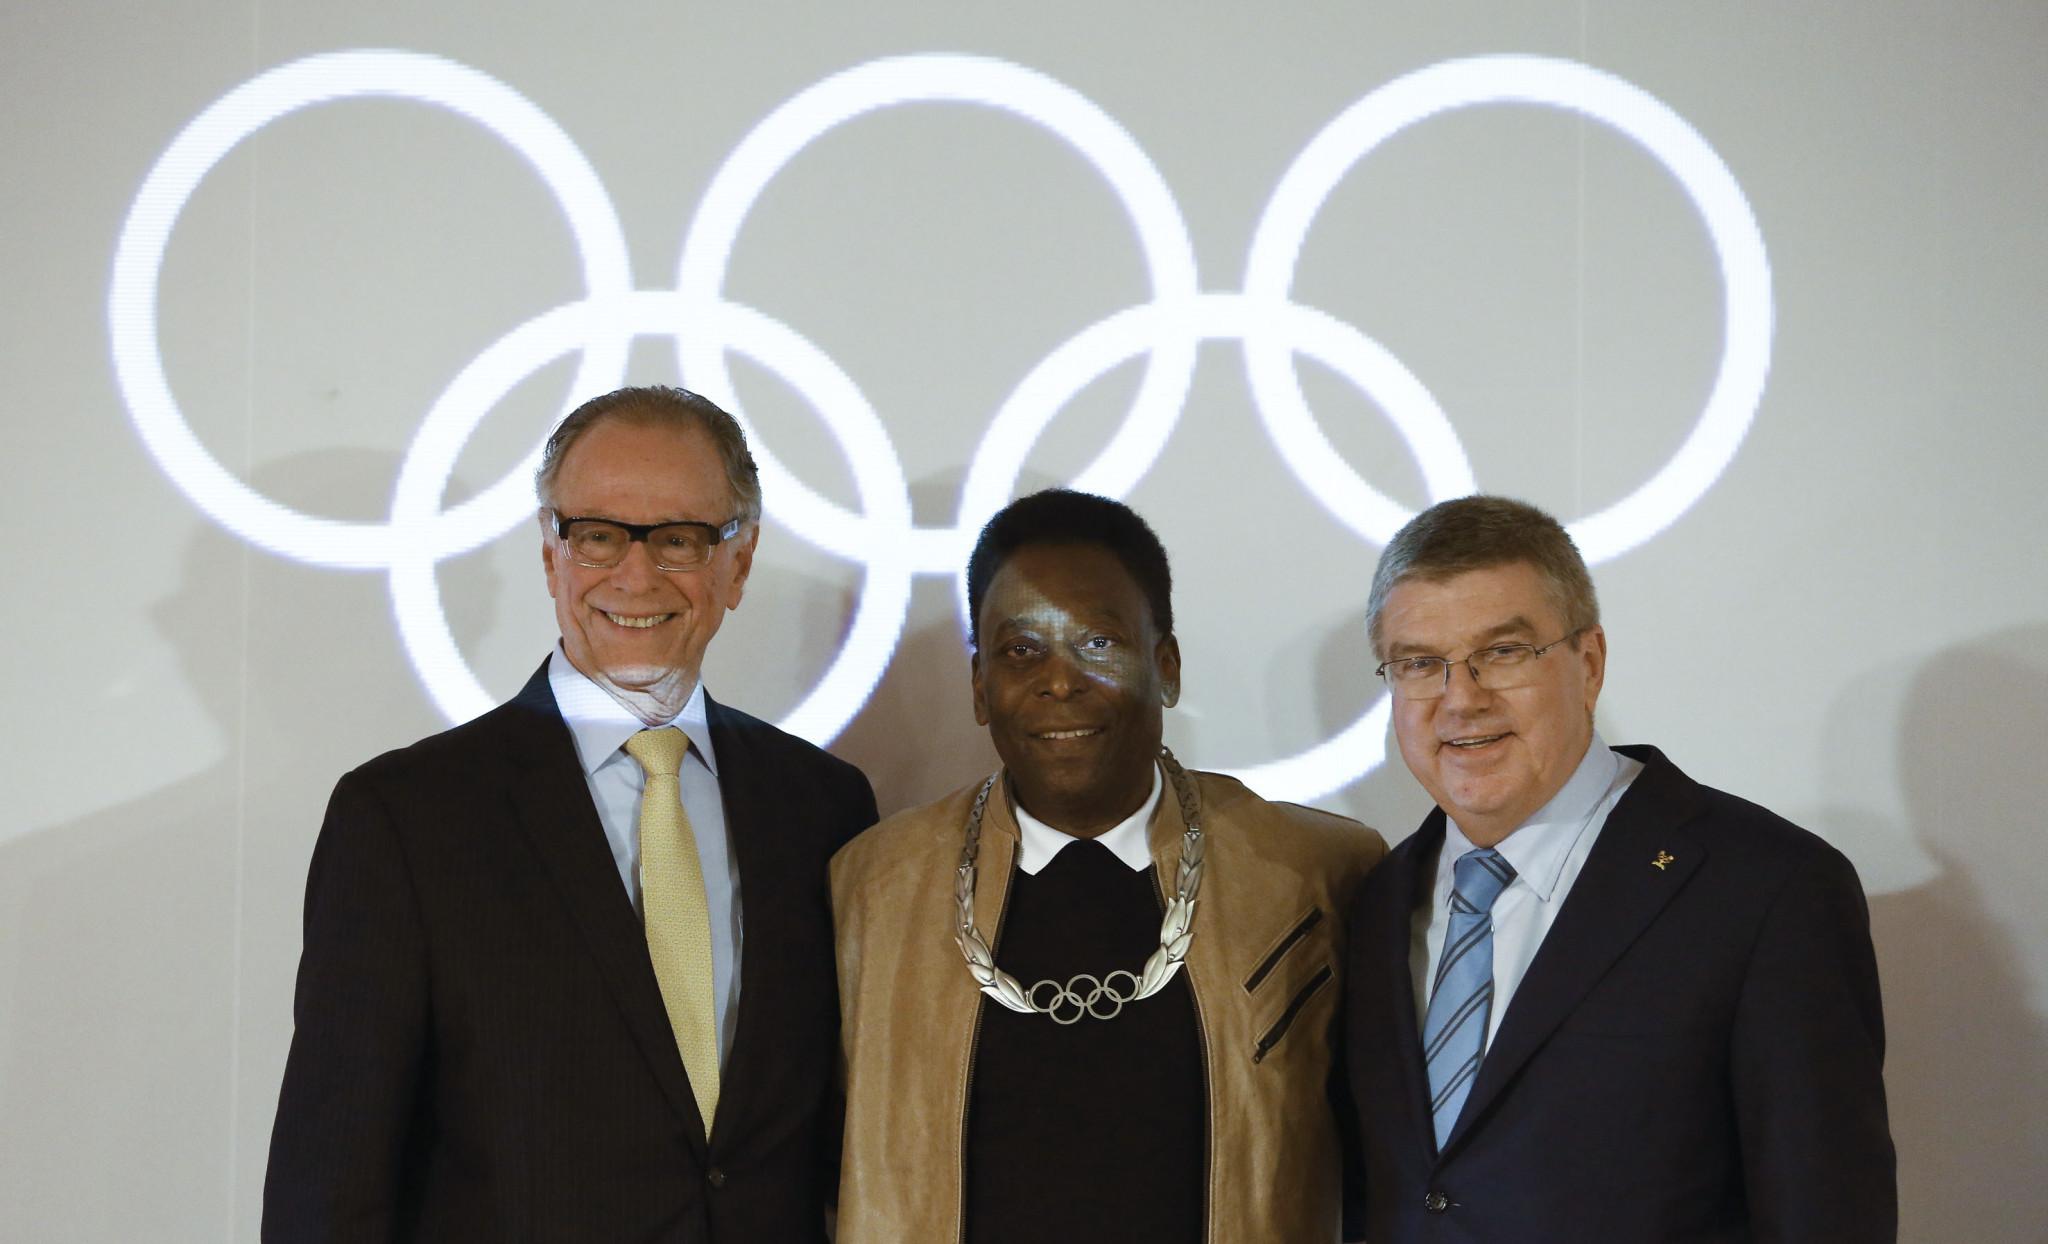 Pelé blames strikes after failing to testify in Rio 2016 bribery investigation